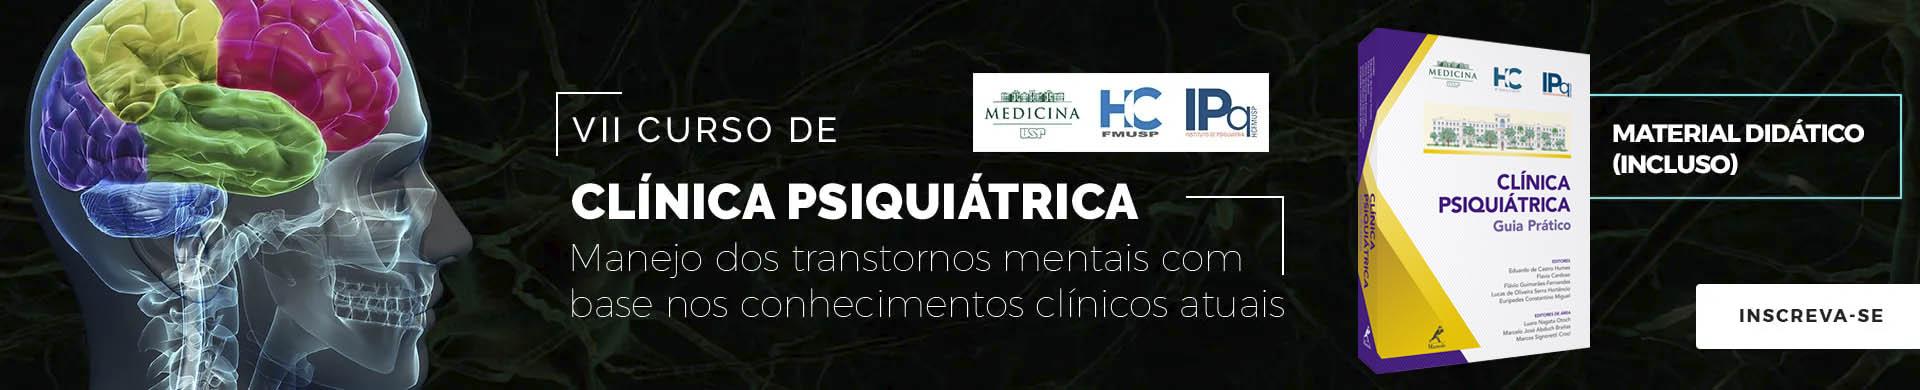 Clinica Psiquiatria 2019